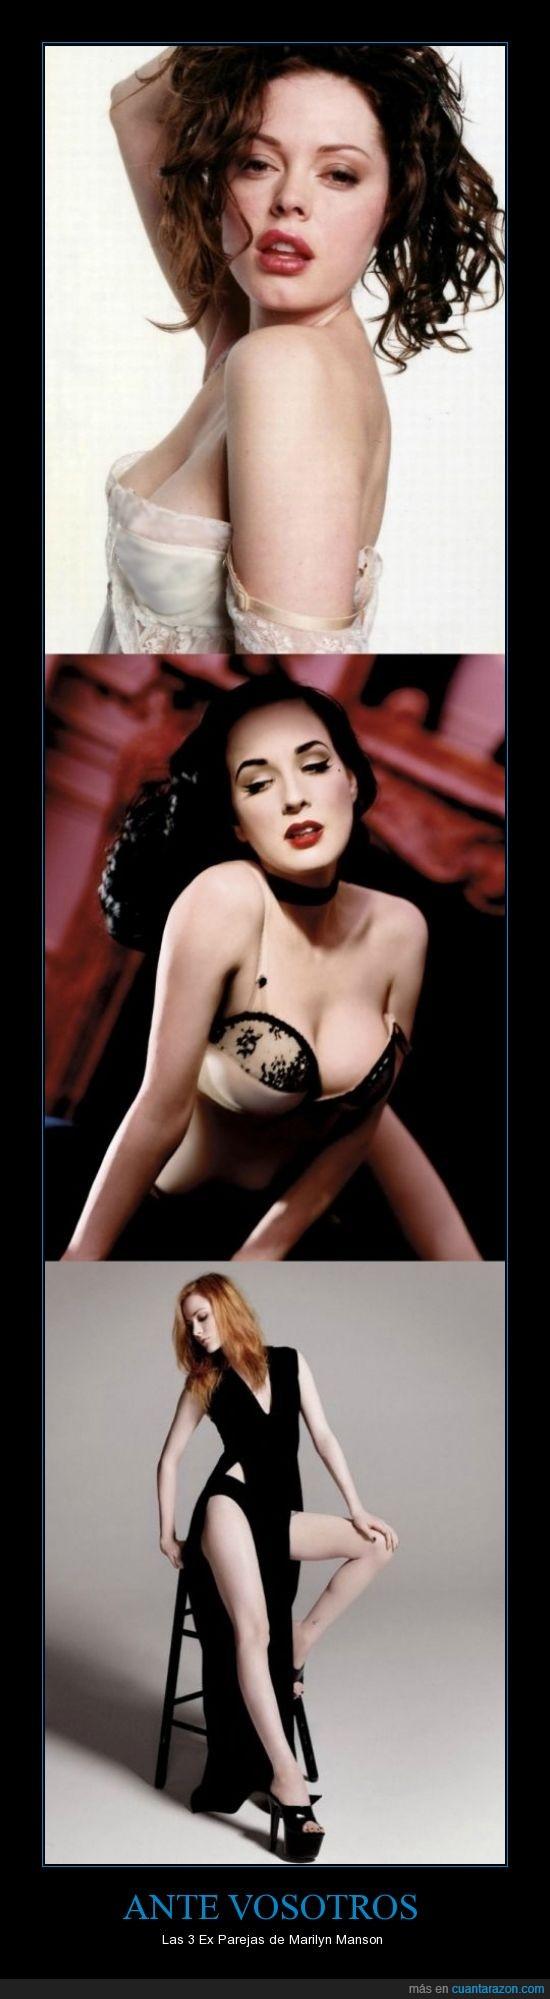 Dita Von Teese,Evan Rachel Wood,guapas,Marilyn Manson,Rose Mcgowan